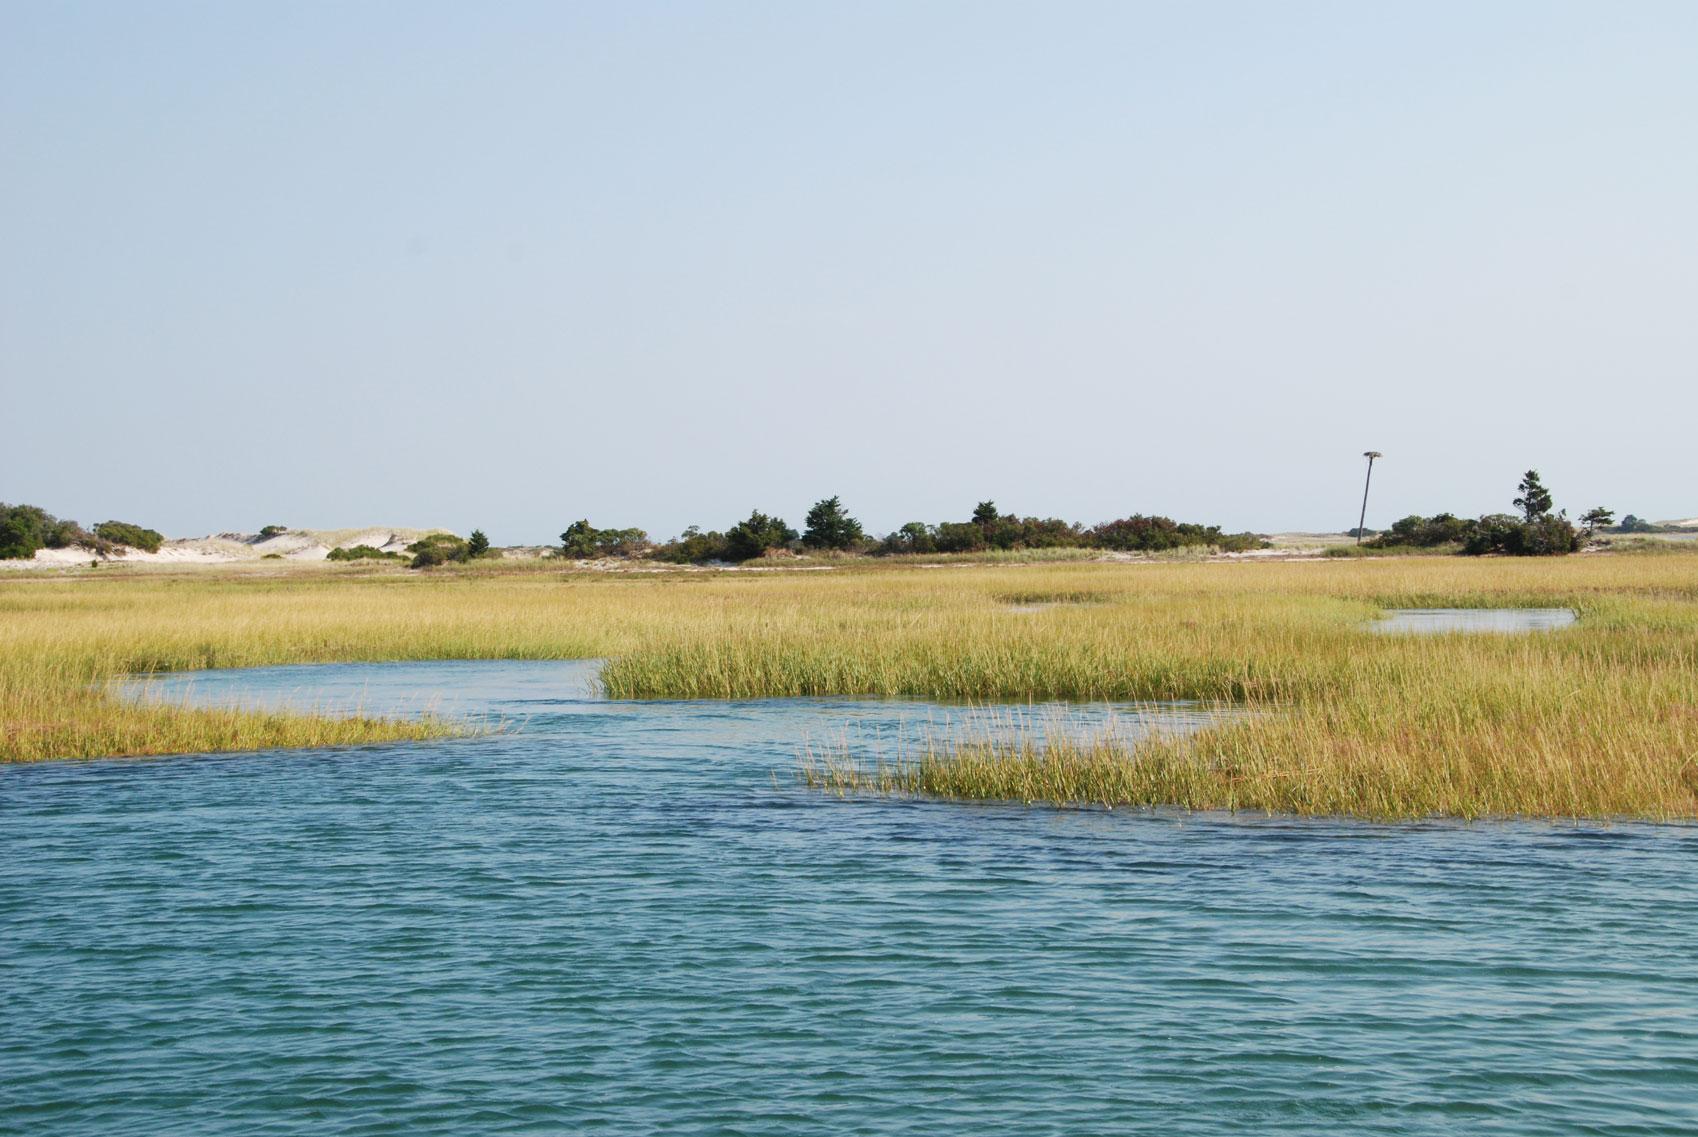 Osprey Nest in Barnstable Harbor Marsh